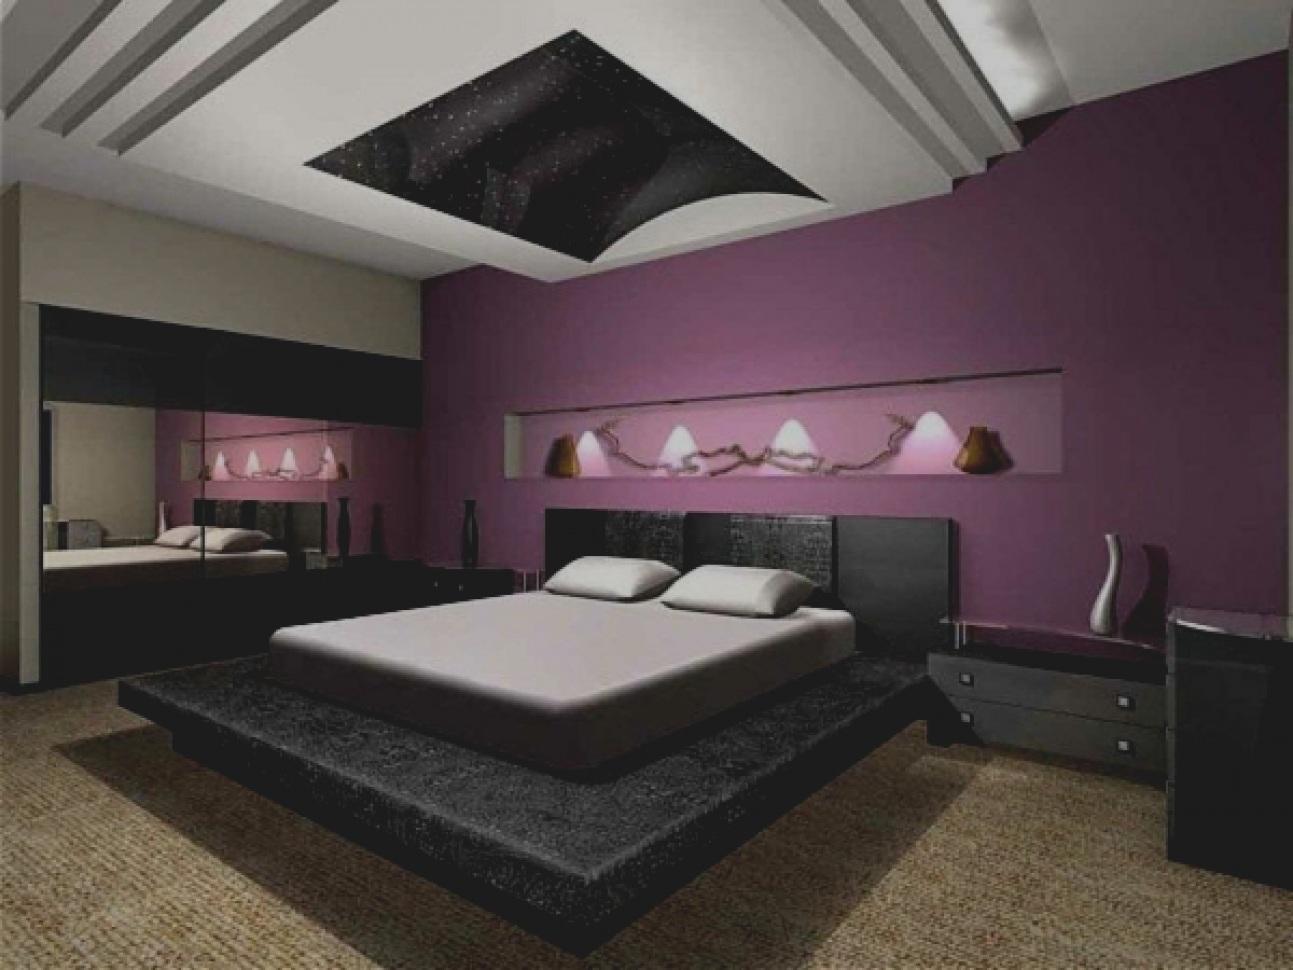 صور اصباغ غرف نوم , اجمل صور دهانات لغرف النوم